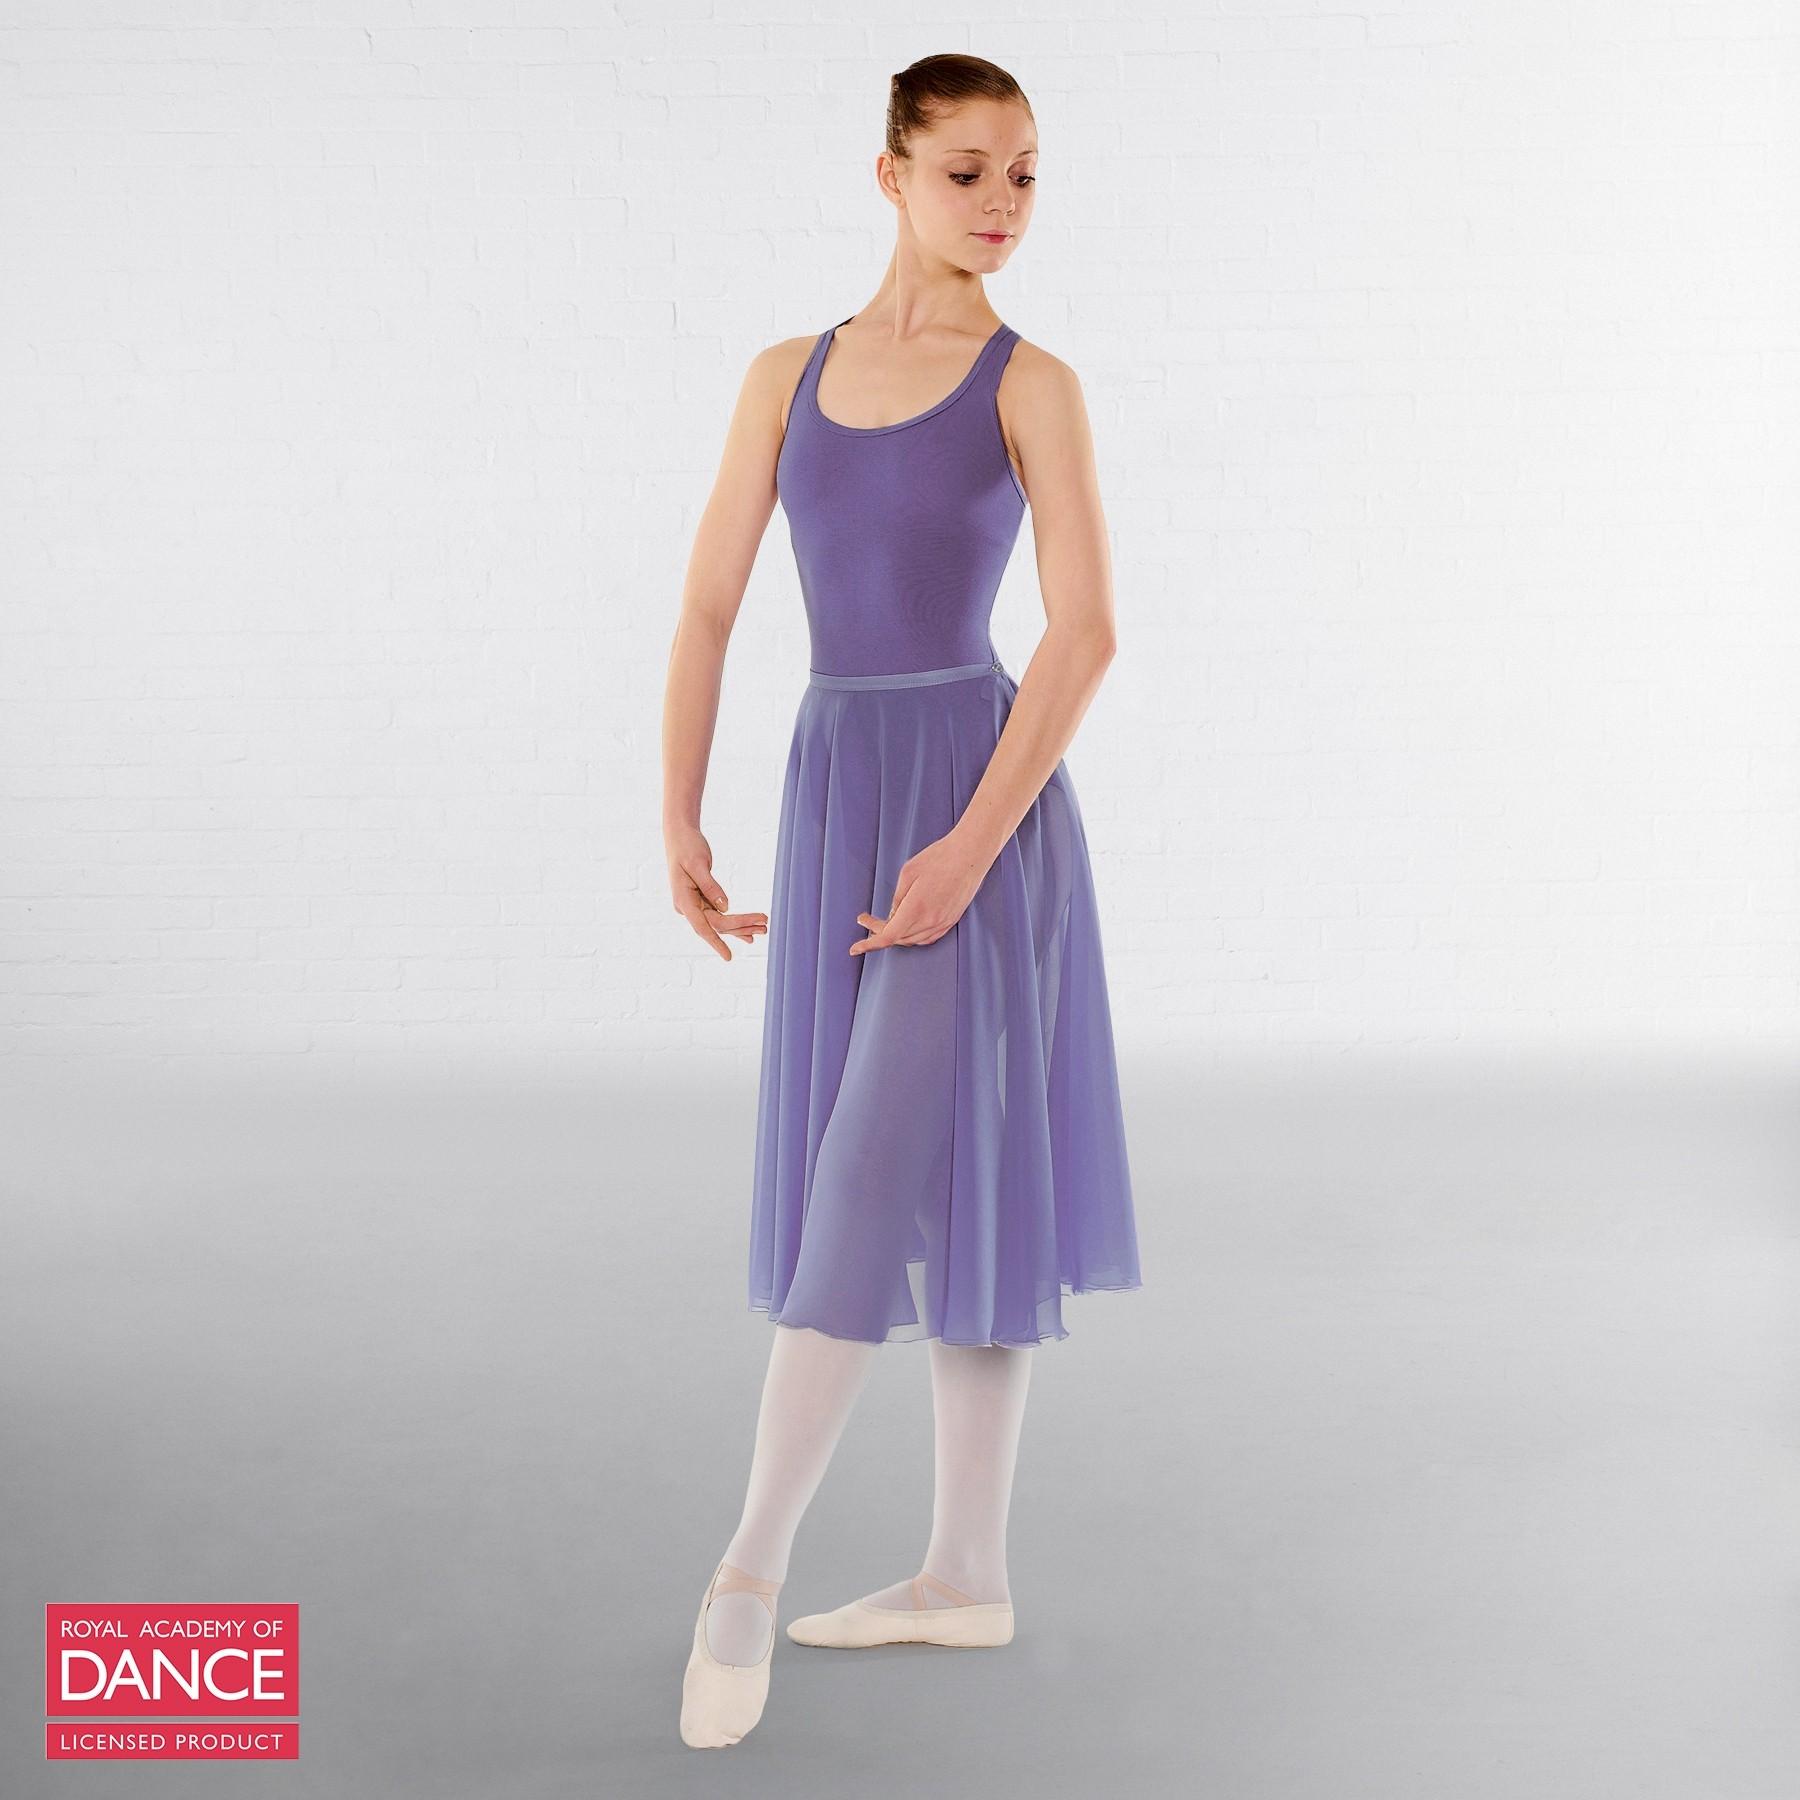 Little Ballerina RAD Approved Circular Poly Chiffon Skirt (Lavender)